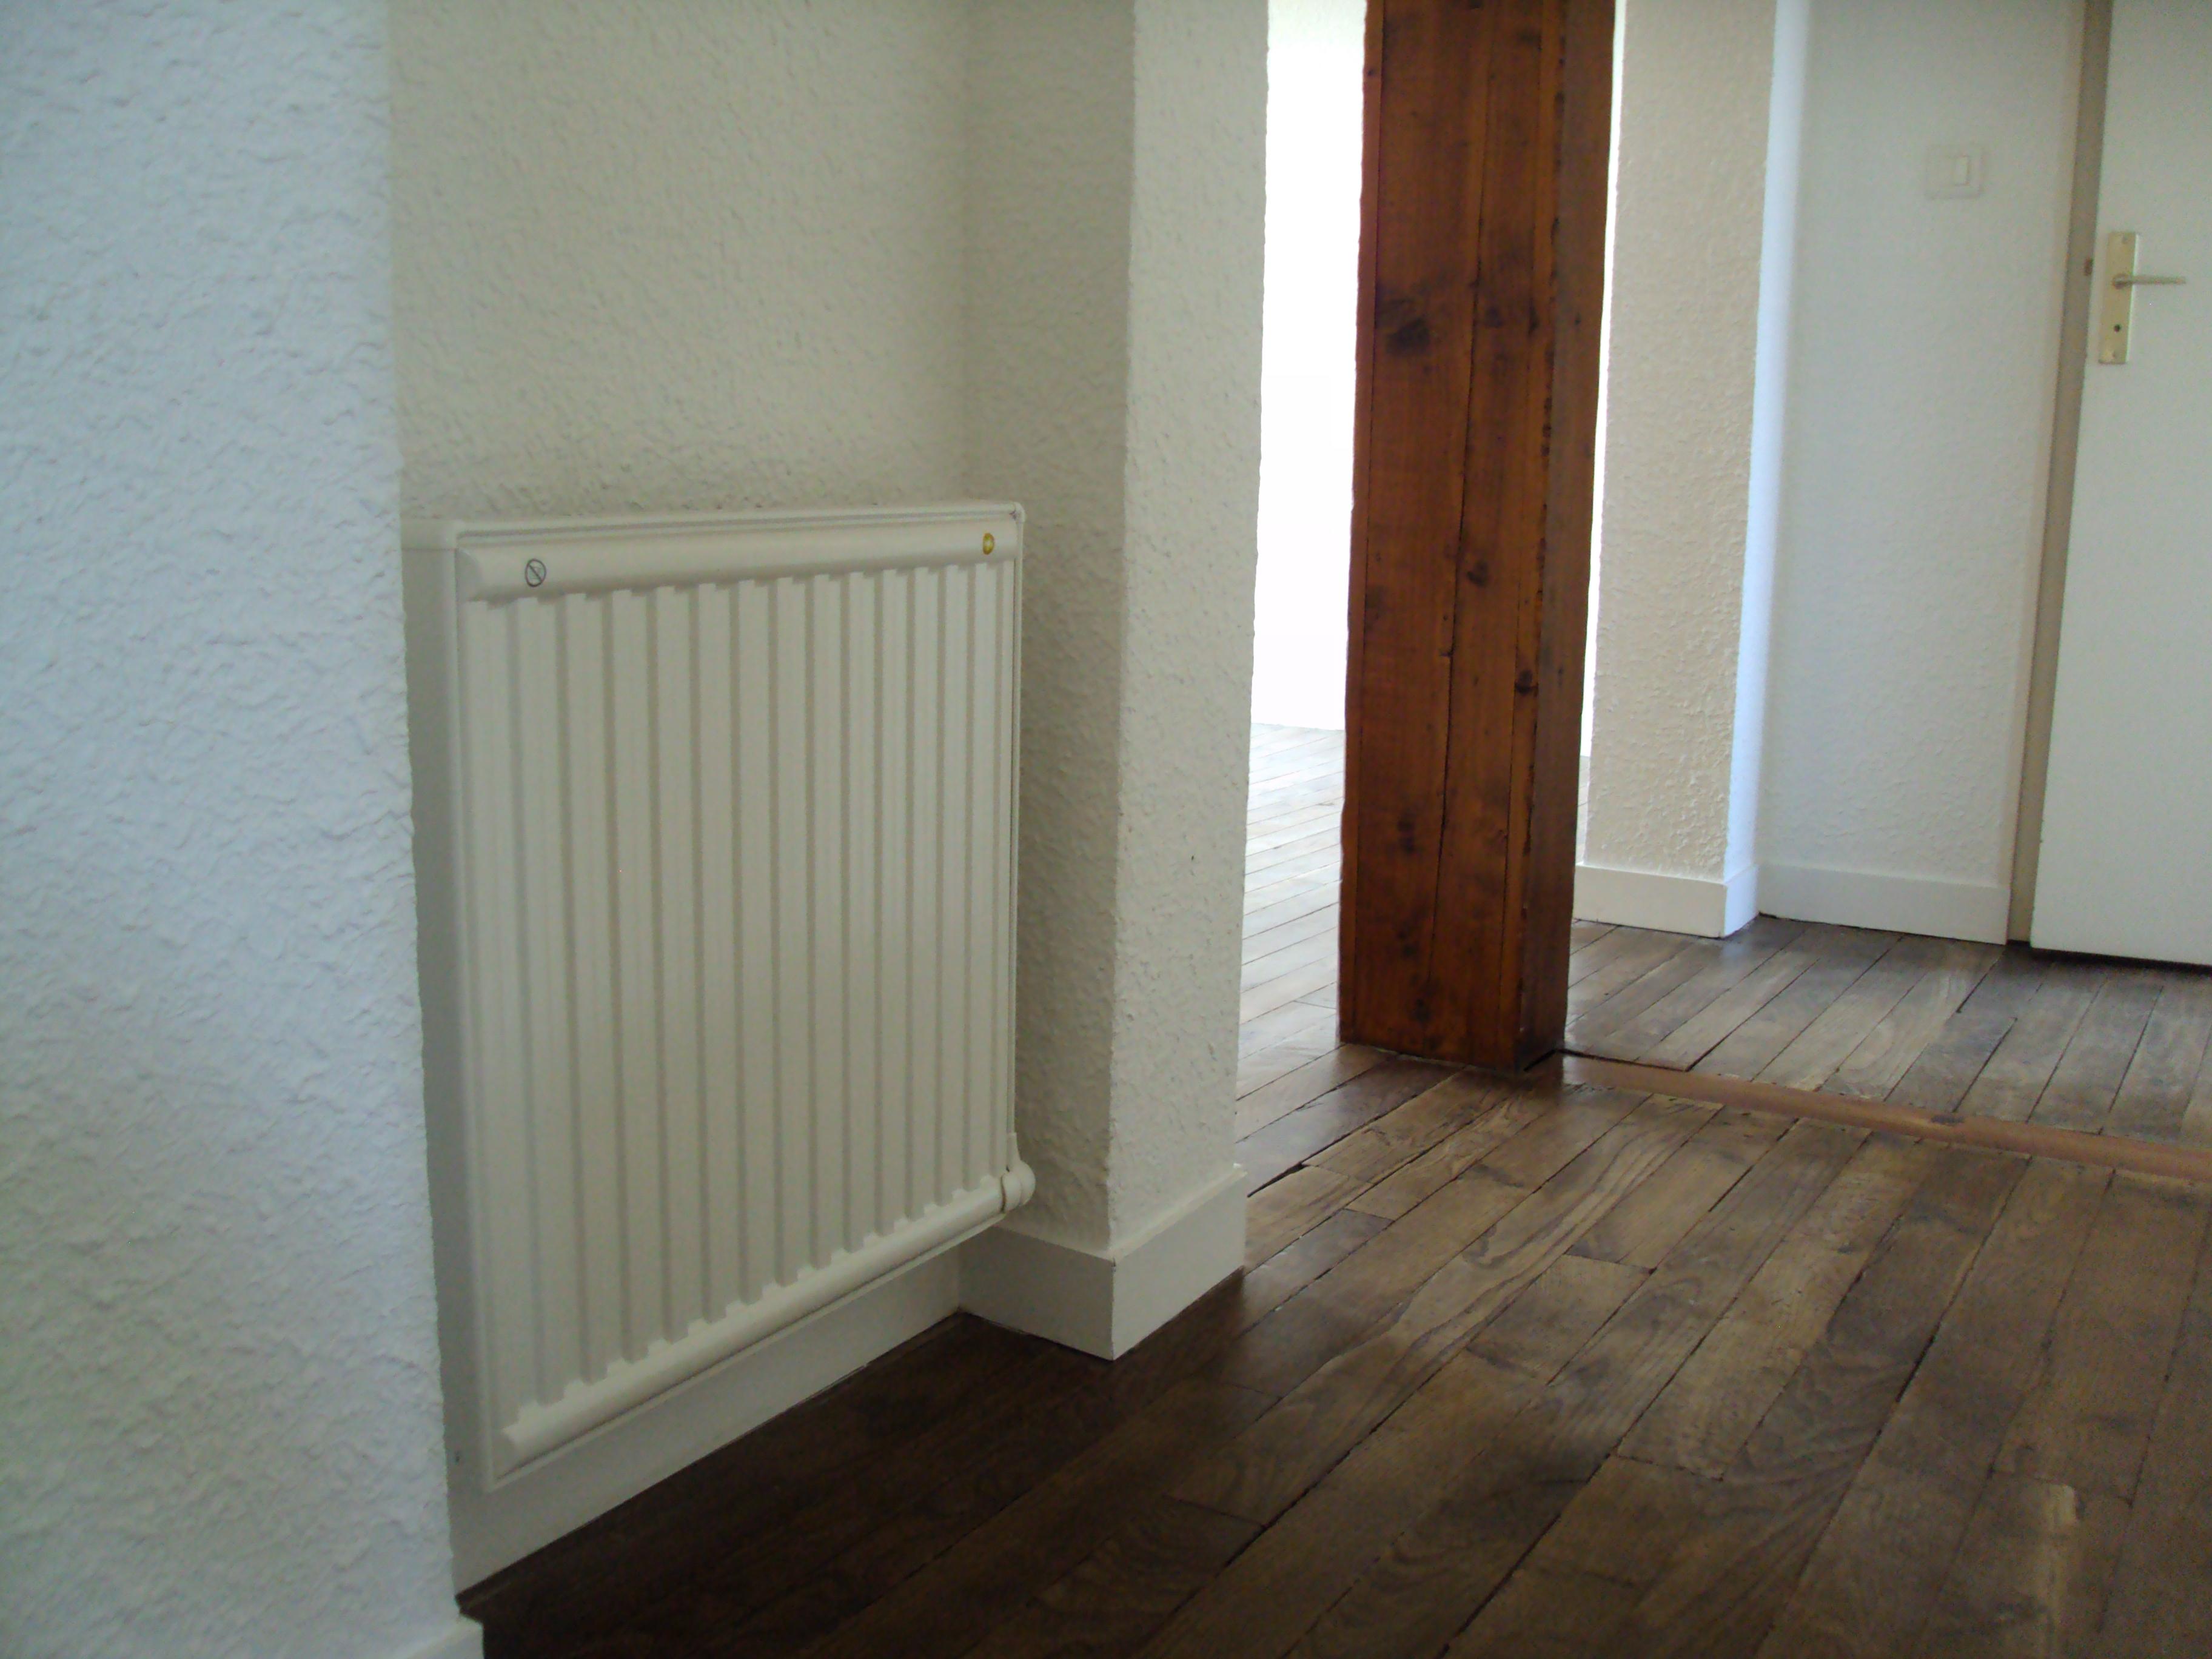 chauffage par inertie top chauffage inertie olympic maison sauter madison with chauffage par. Black Bedroom Furniture Sets. Home Design Ideas